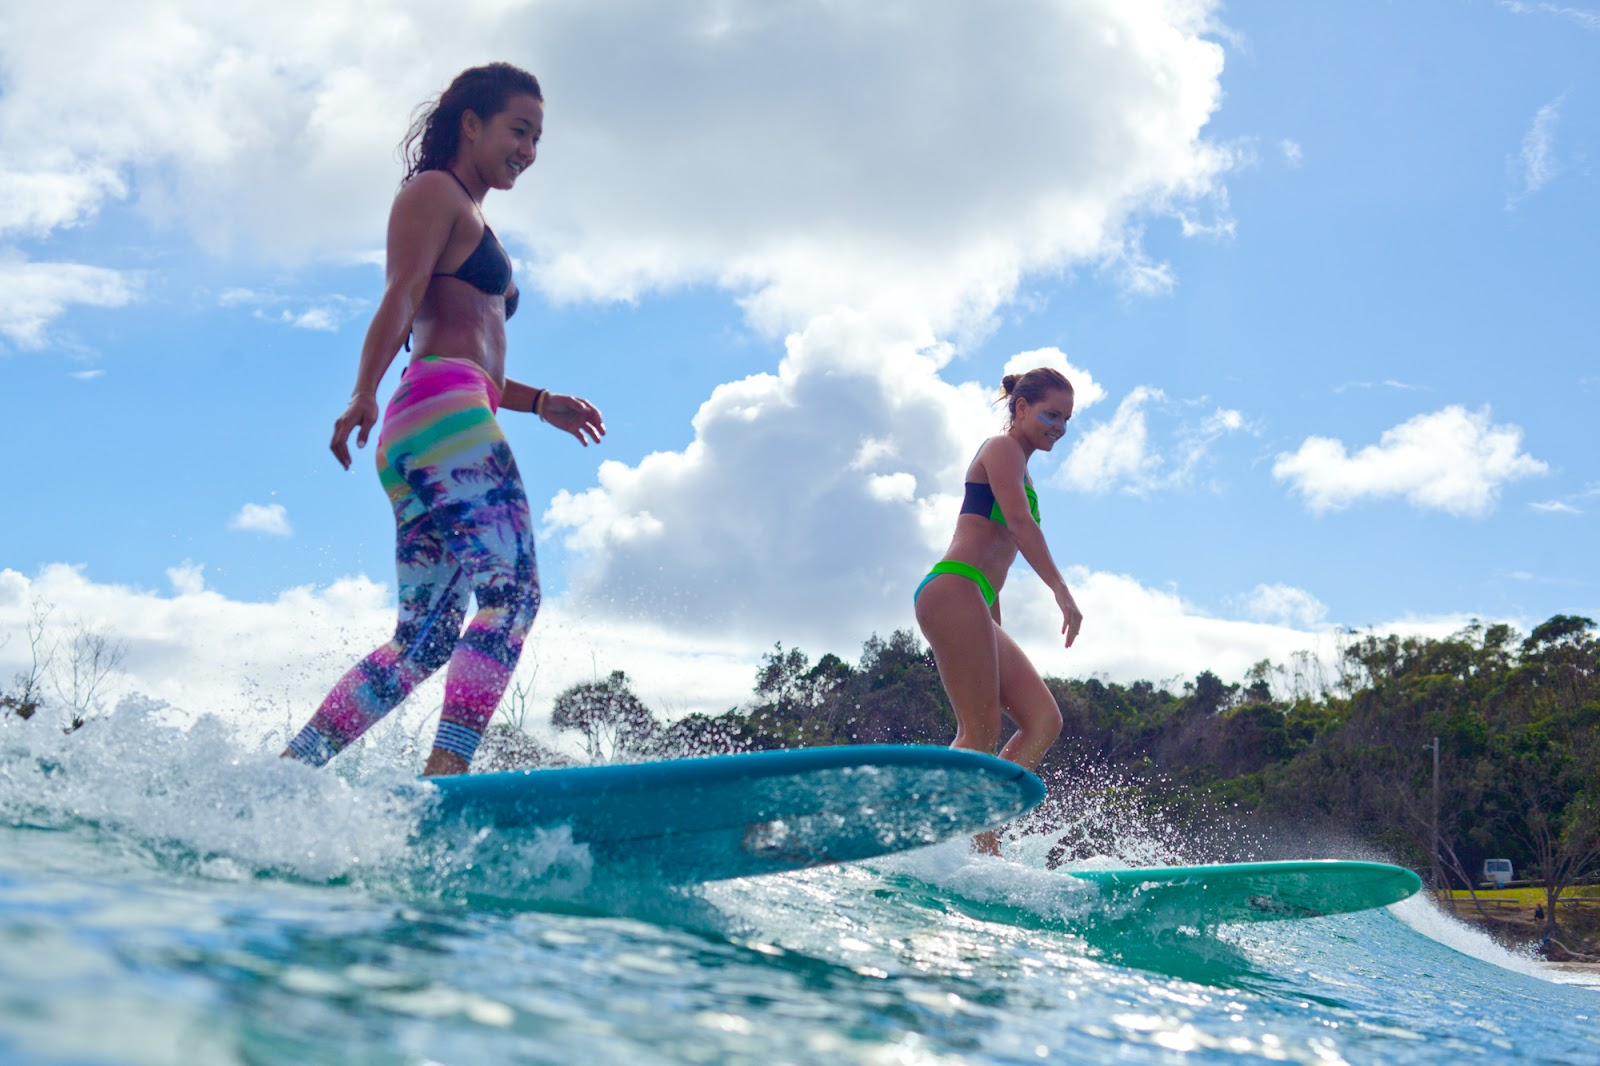 winter surfing roxy wallpaper - photo #22